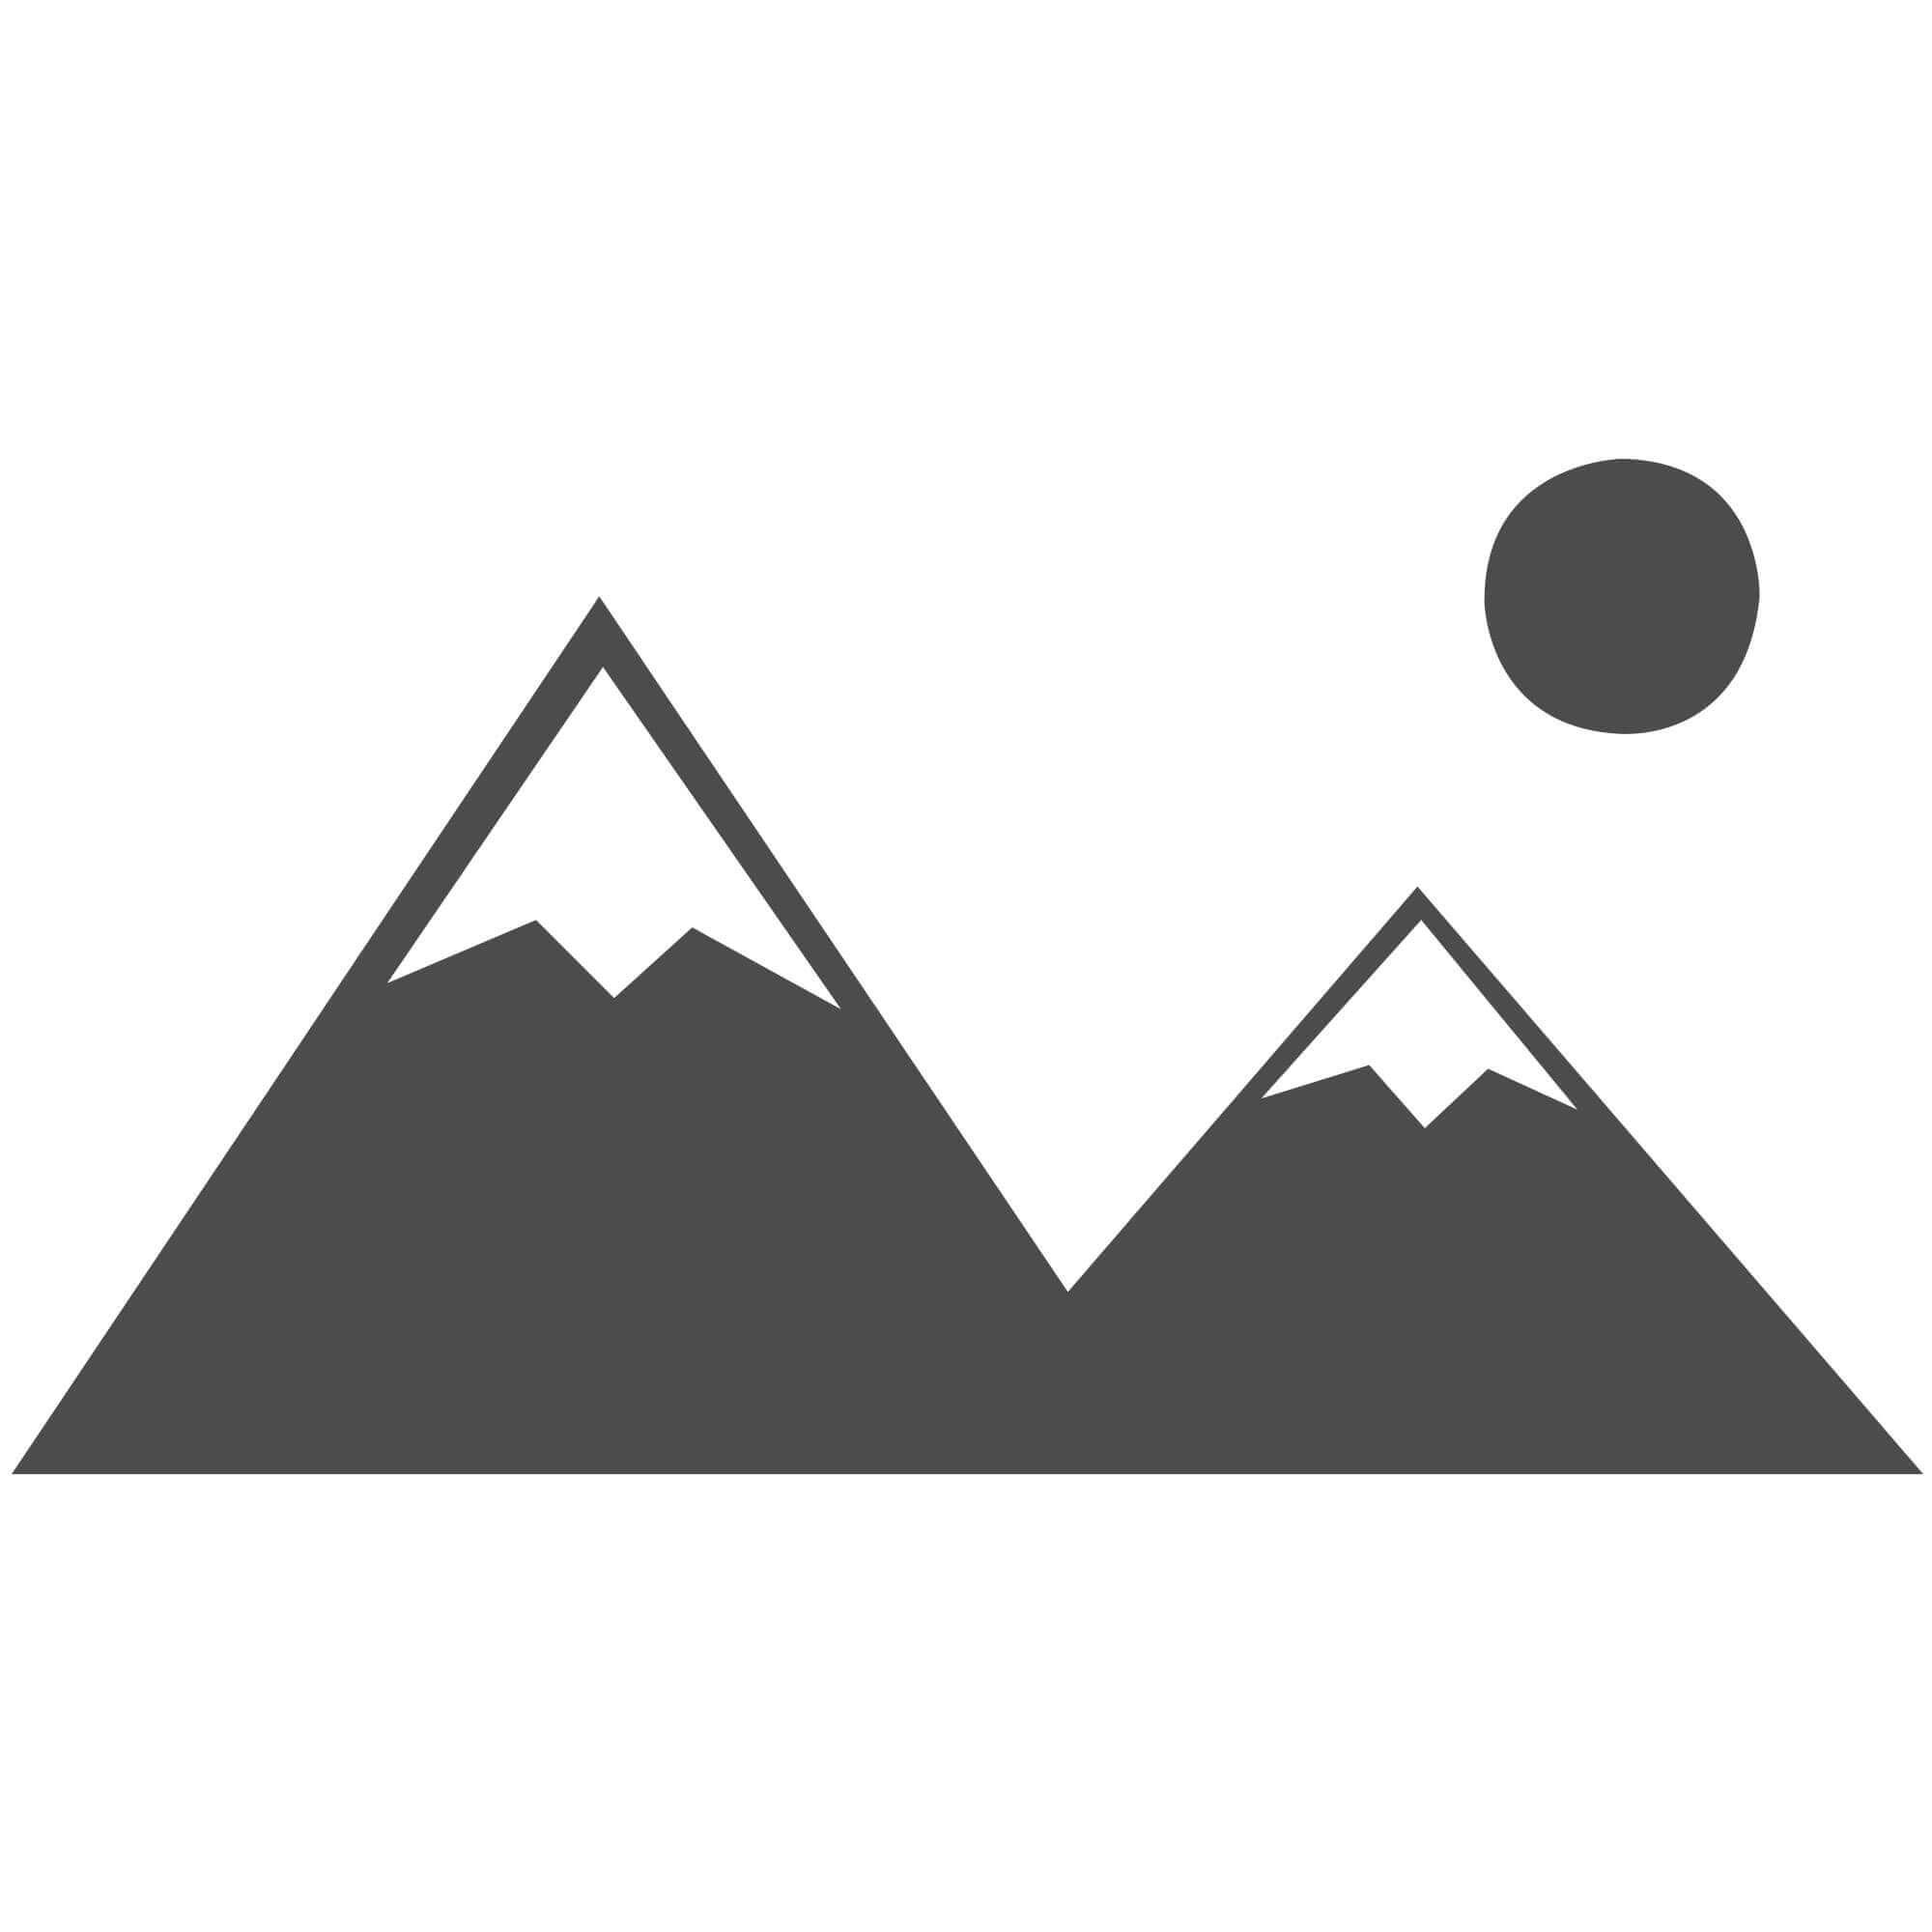 Royal Traditional Wool Rug - Beige-Half Moon 67 x 137 cm